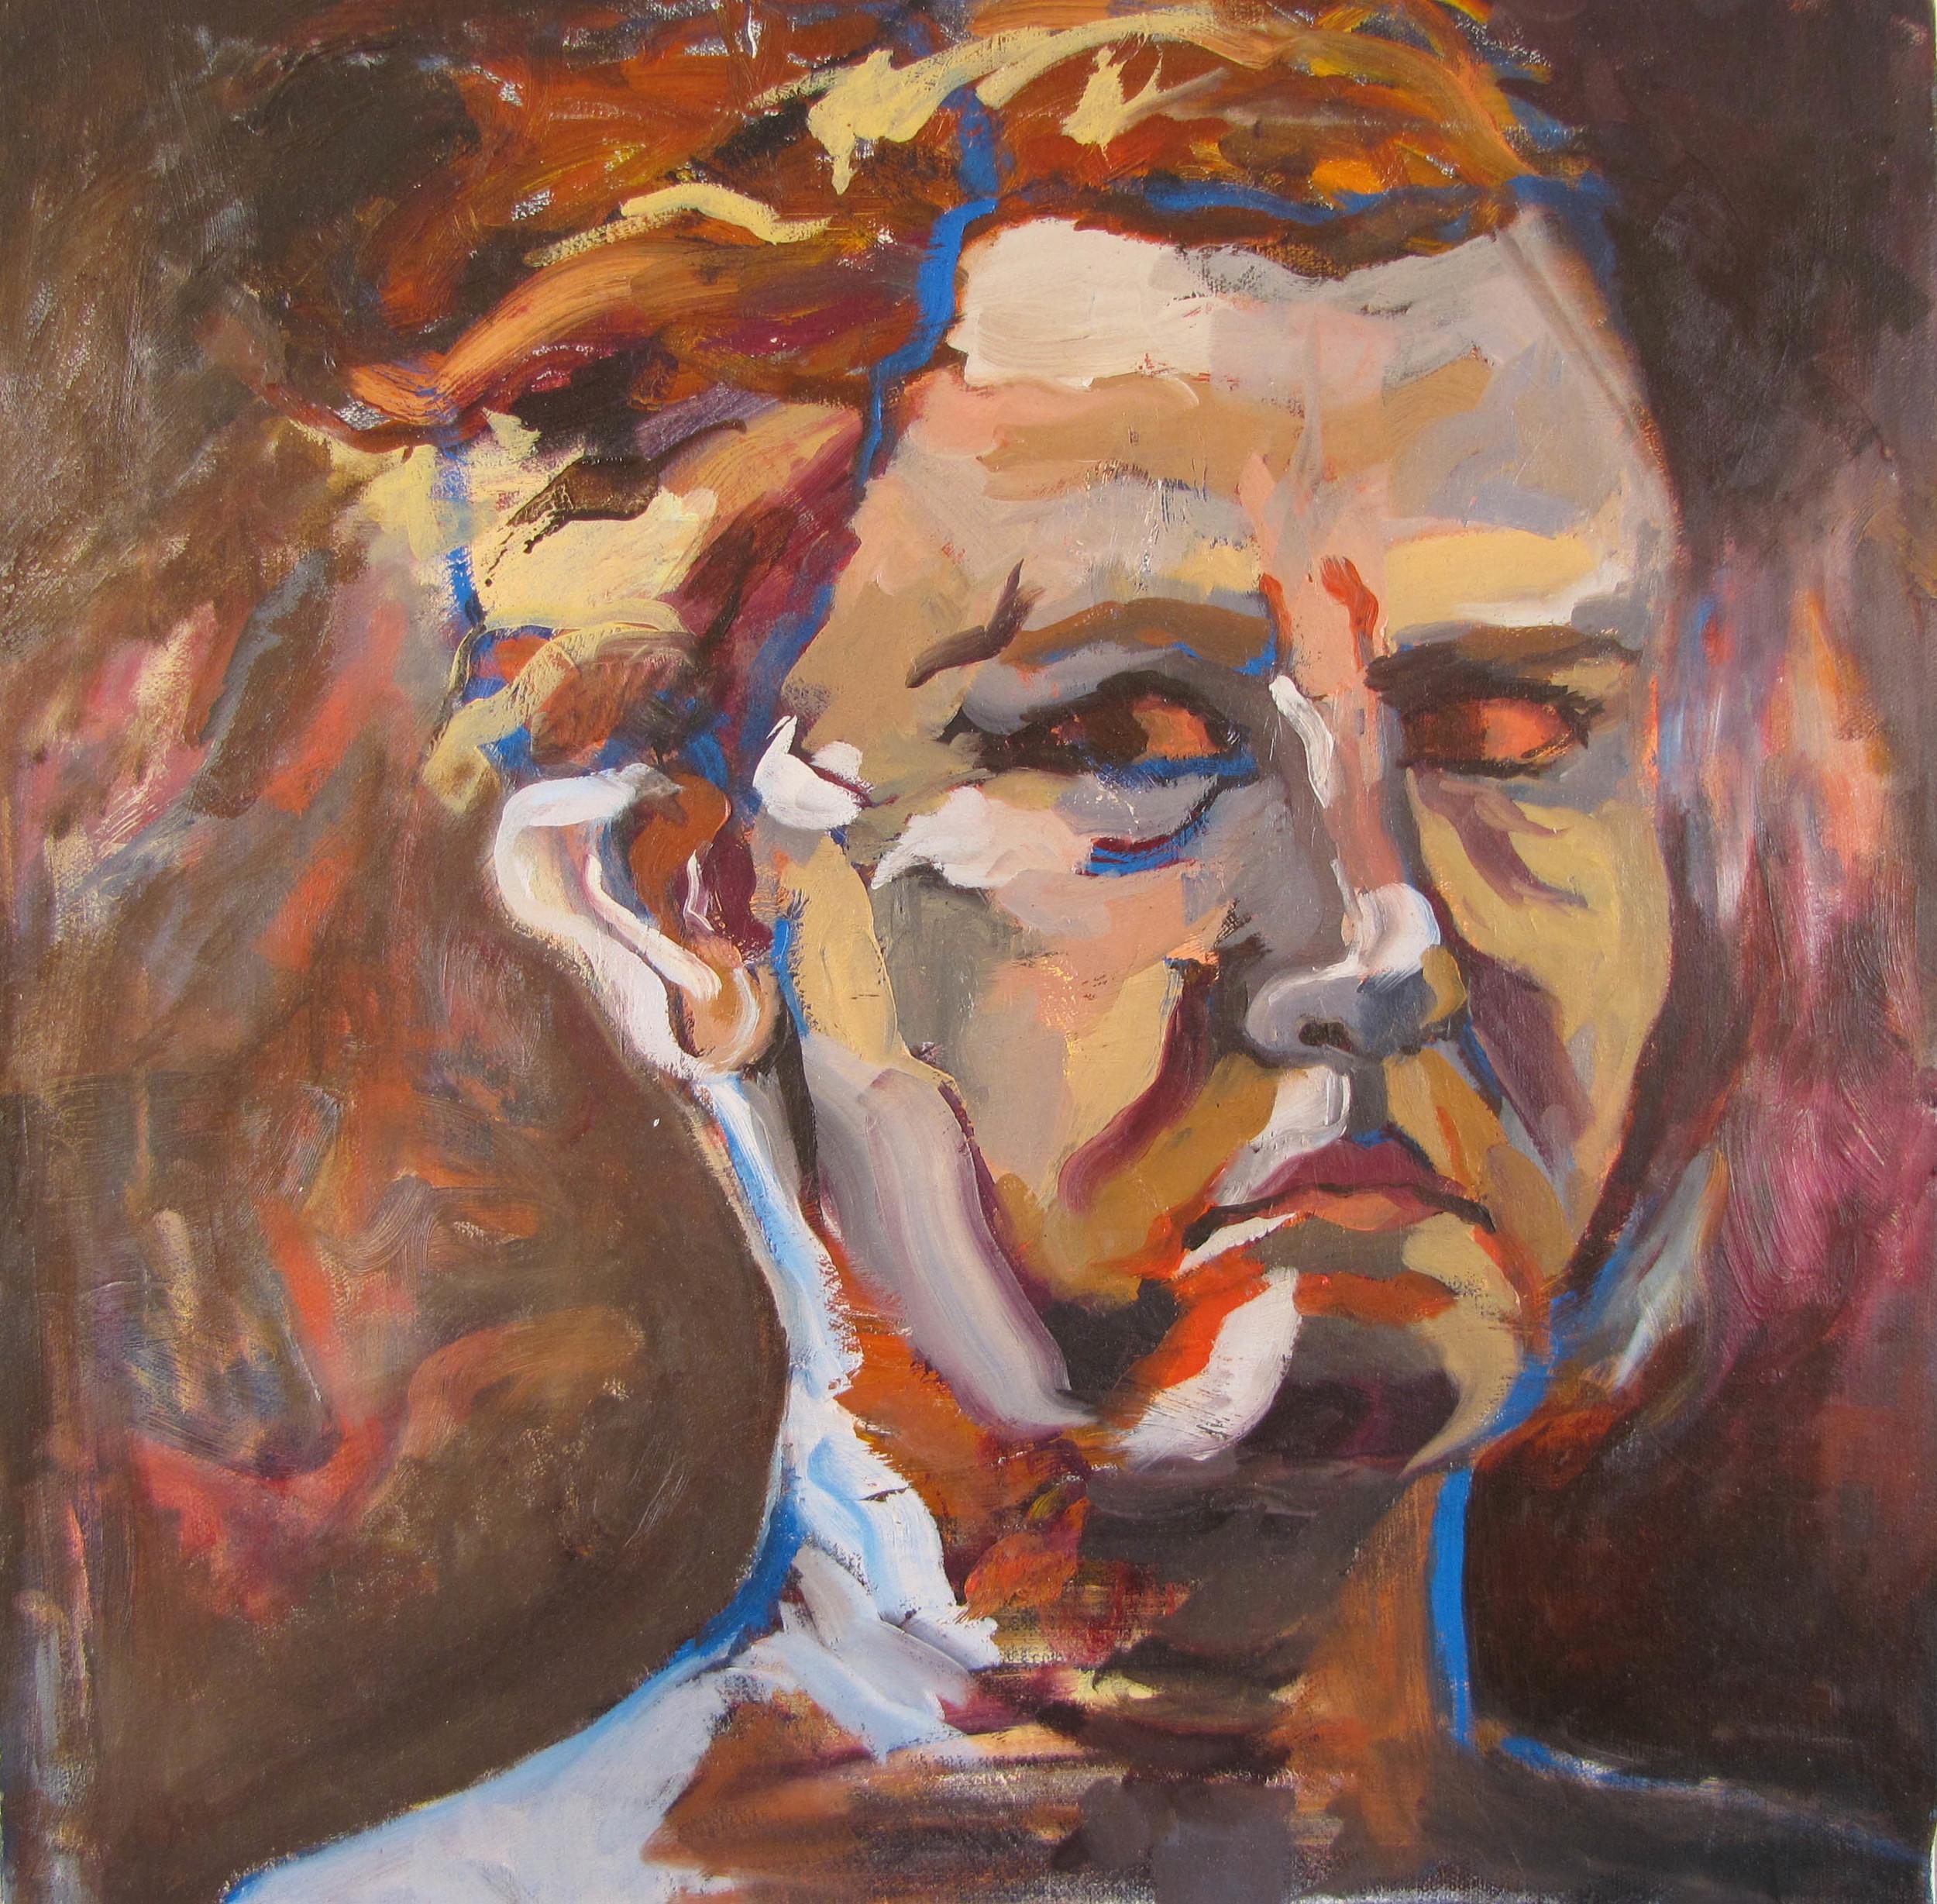 "one/zero, oil on canvas, 18x18"" 2012"